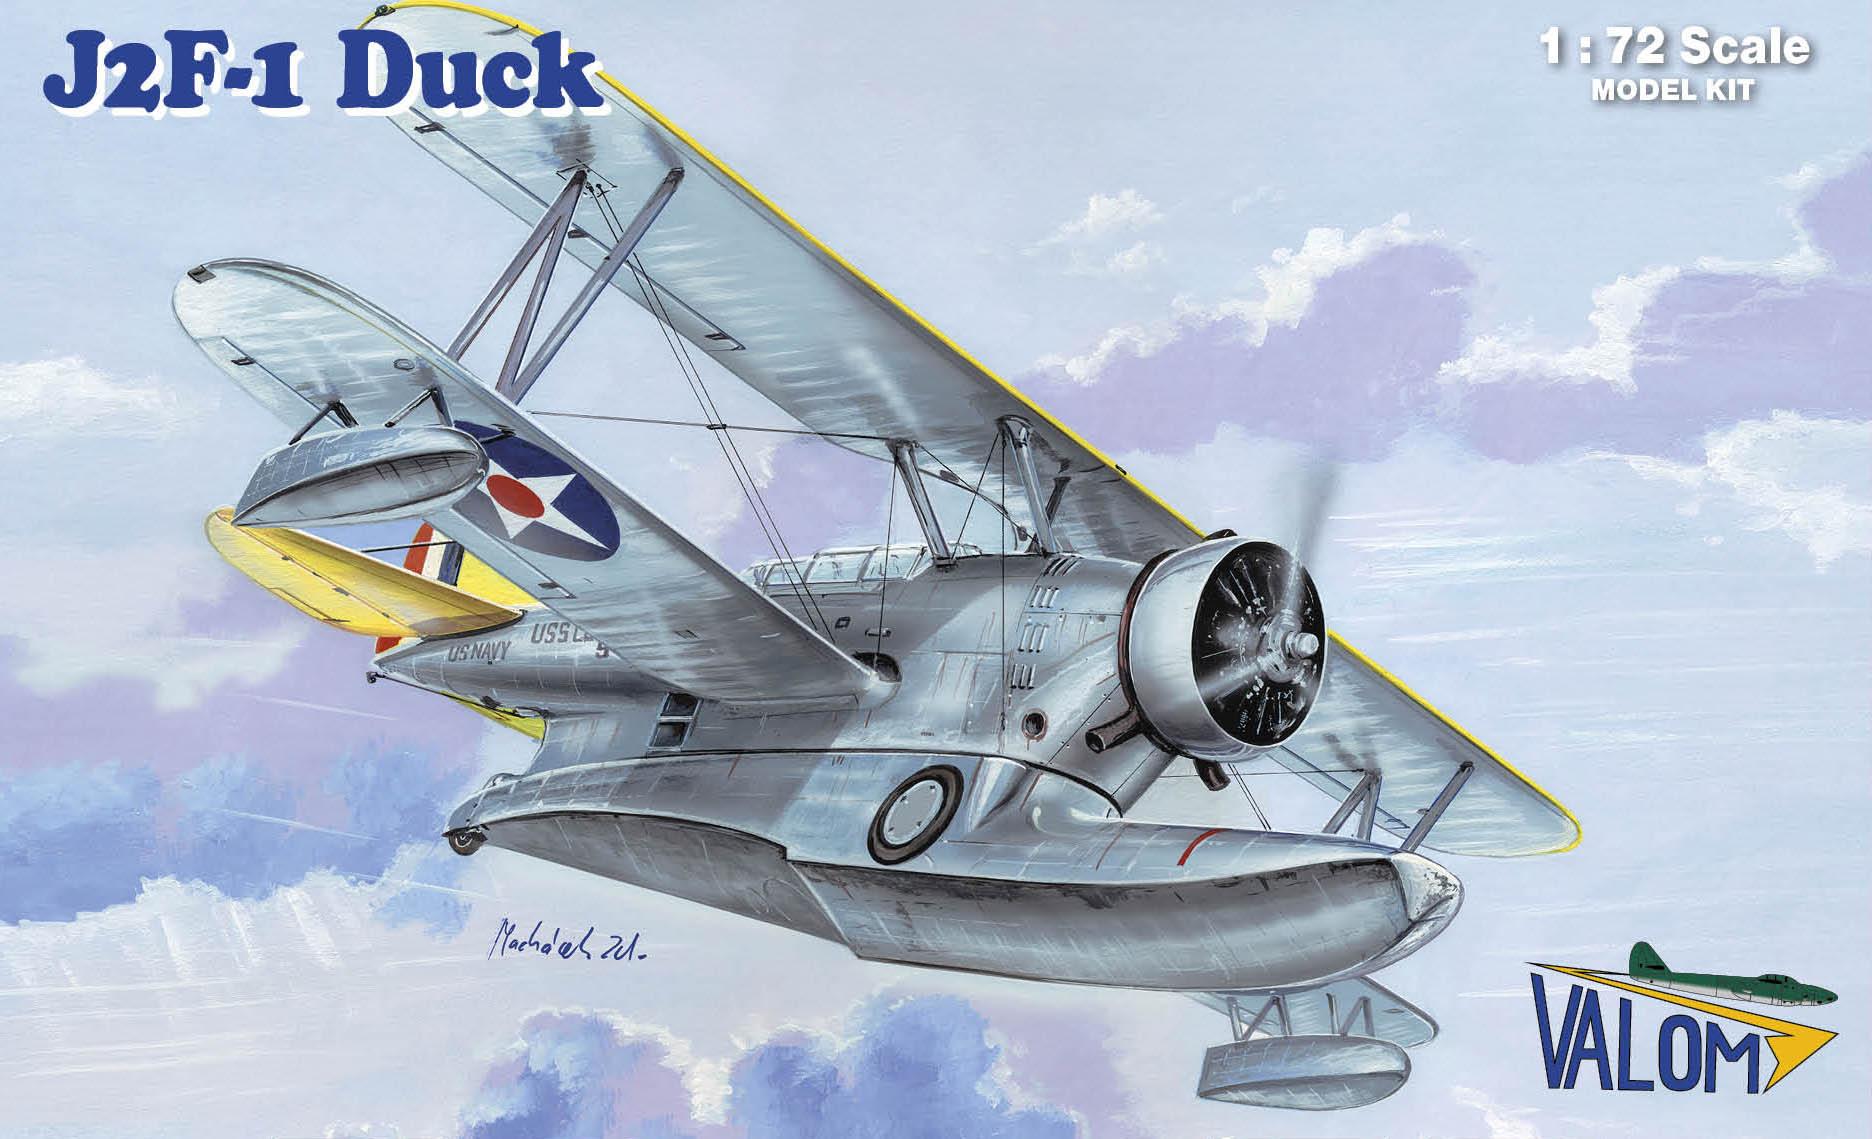 Valom Grumman J2F-1 Duck